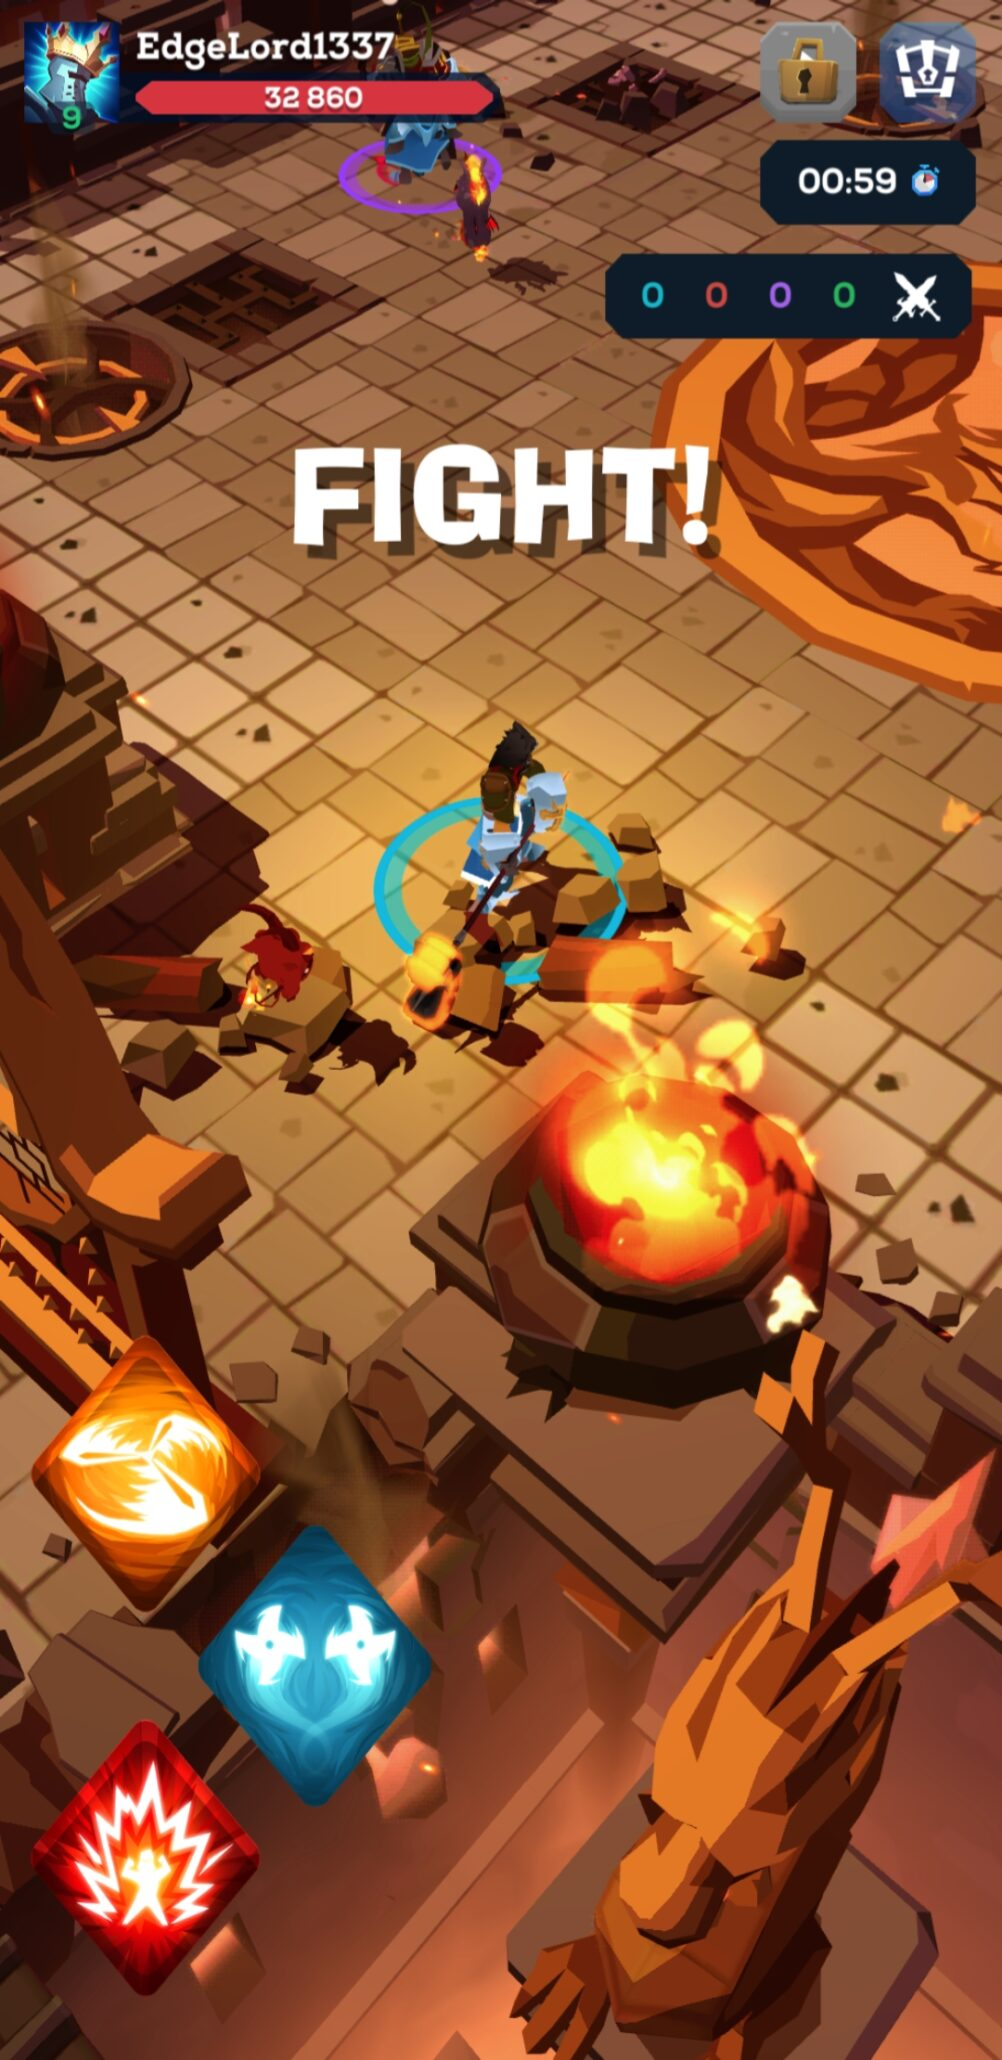 screenshot_20190713-140523_mighty-quest